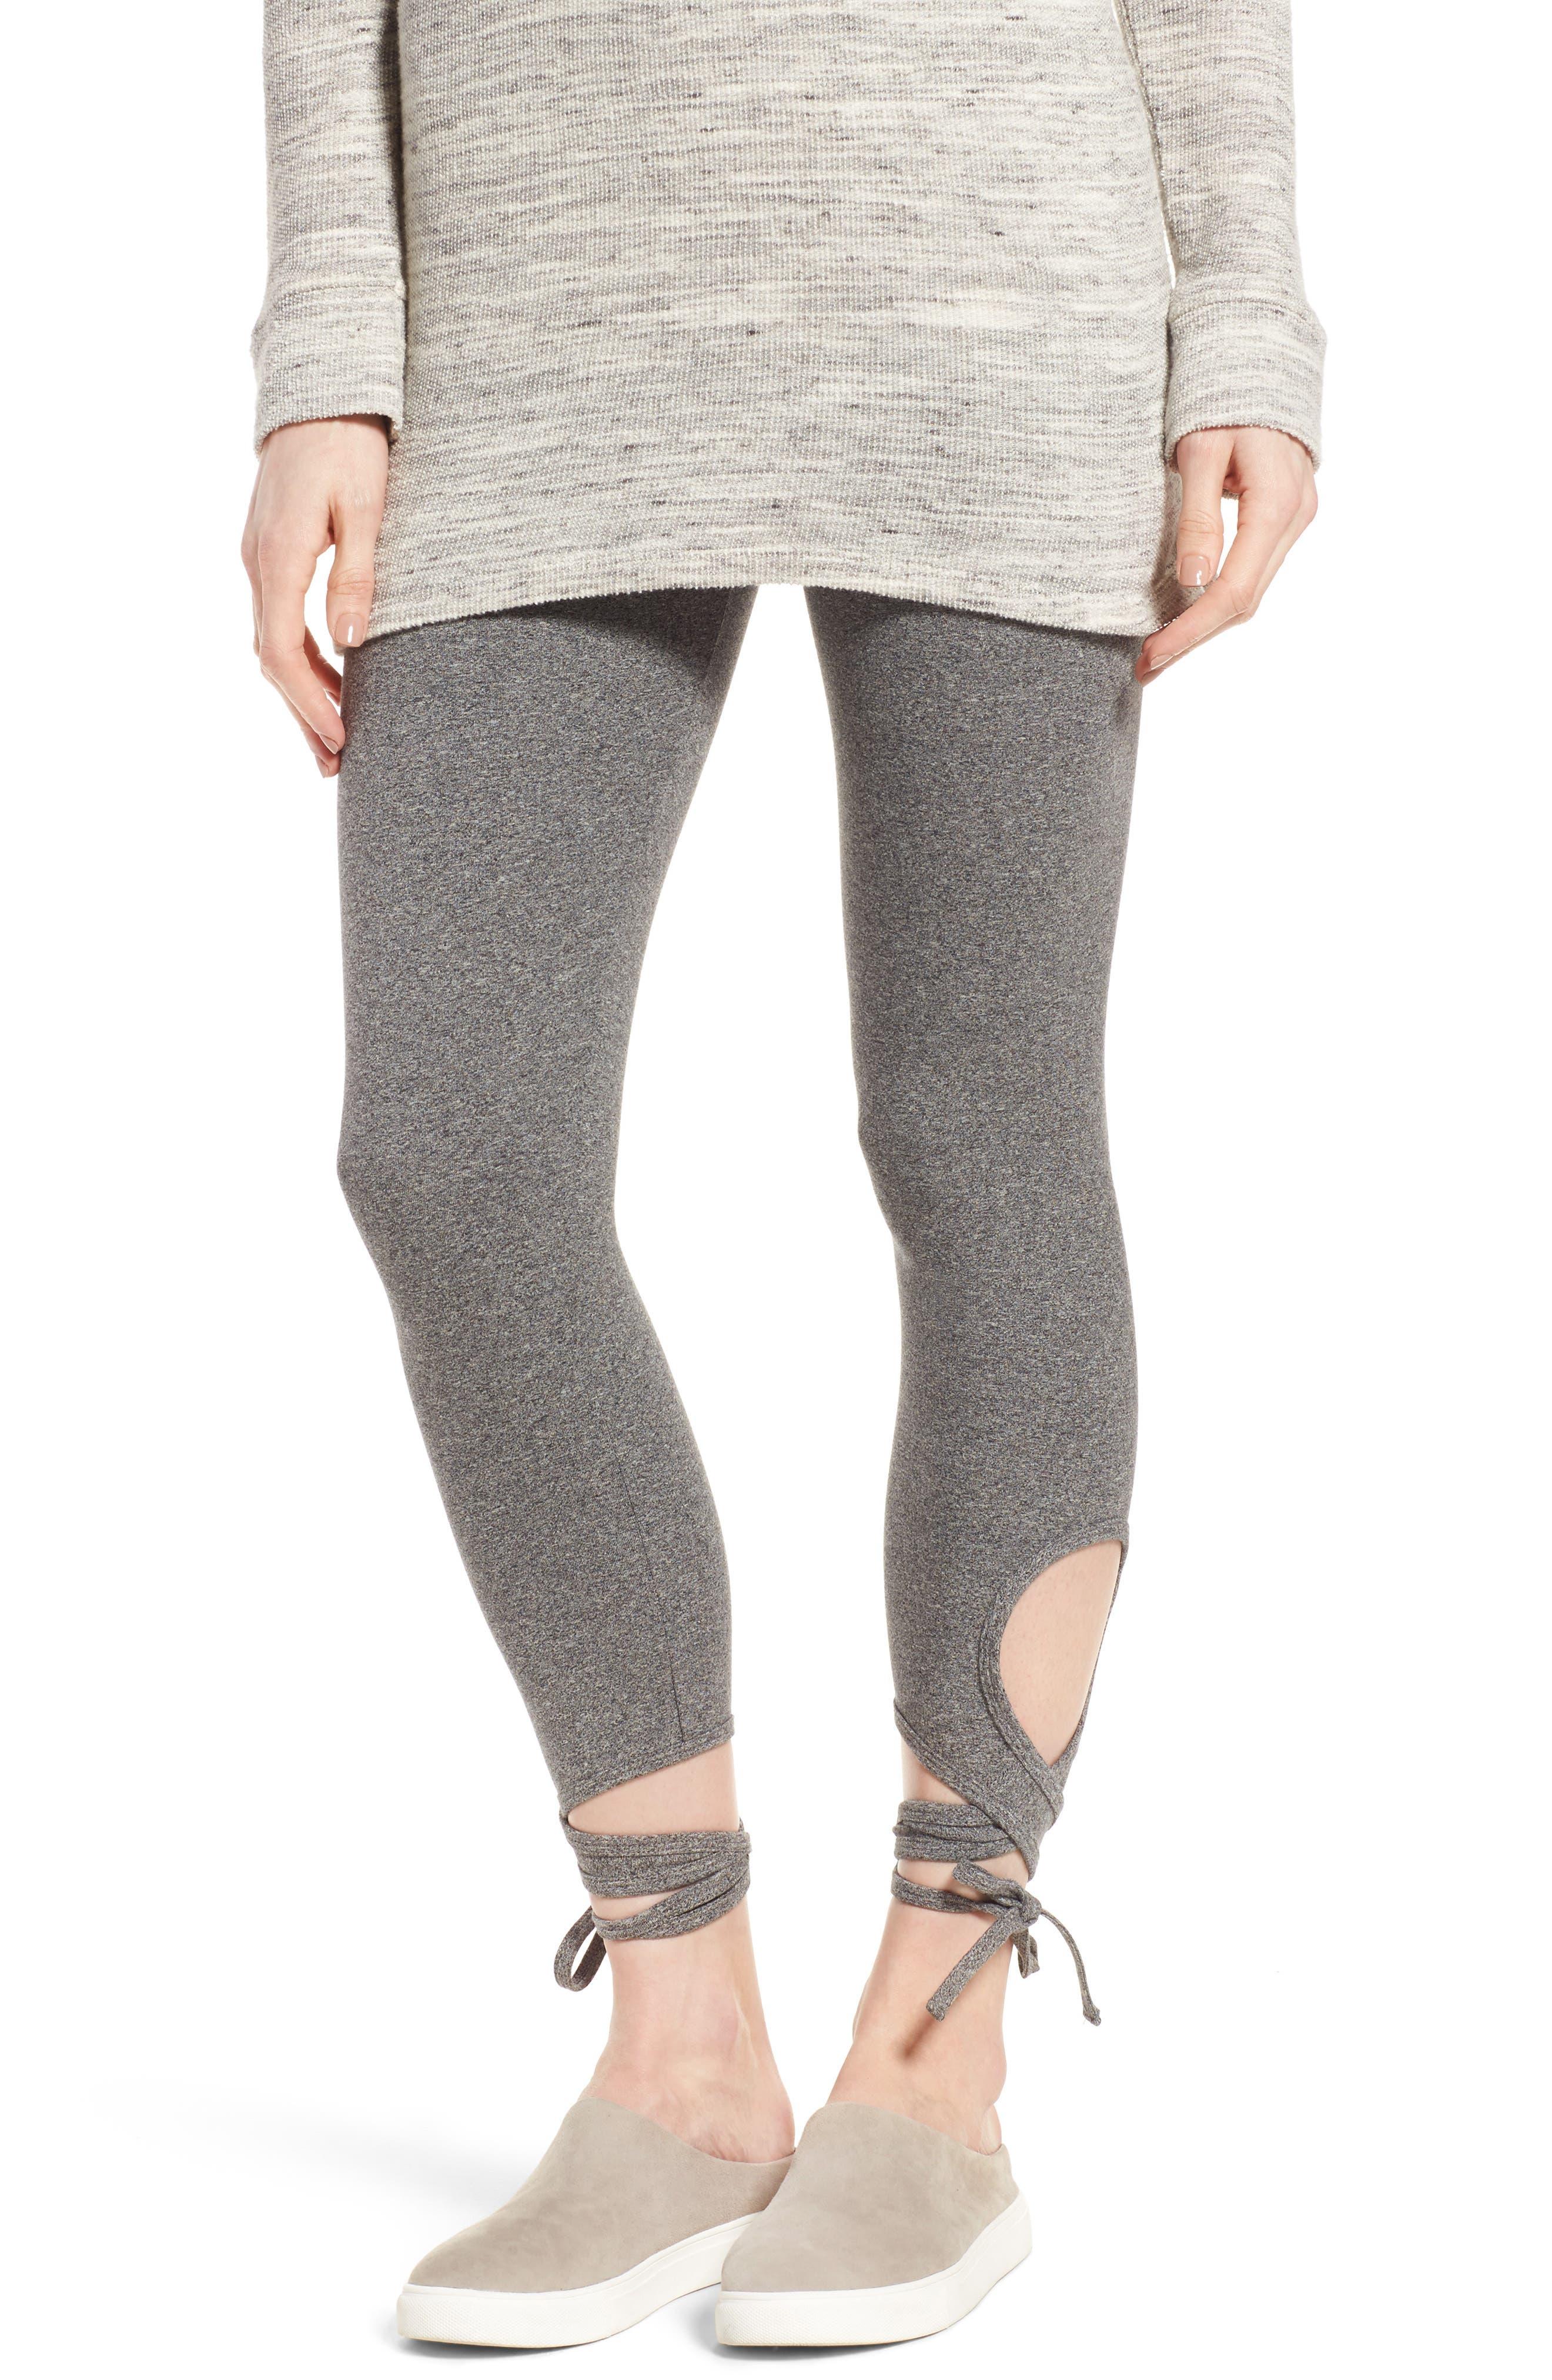 High Rise Wrap Ankle Leggings,                         Main,                         color, Salt And Pepper